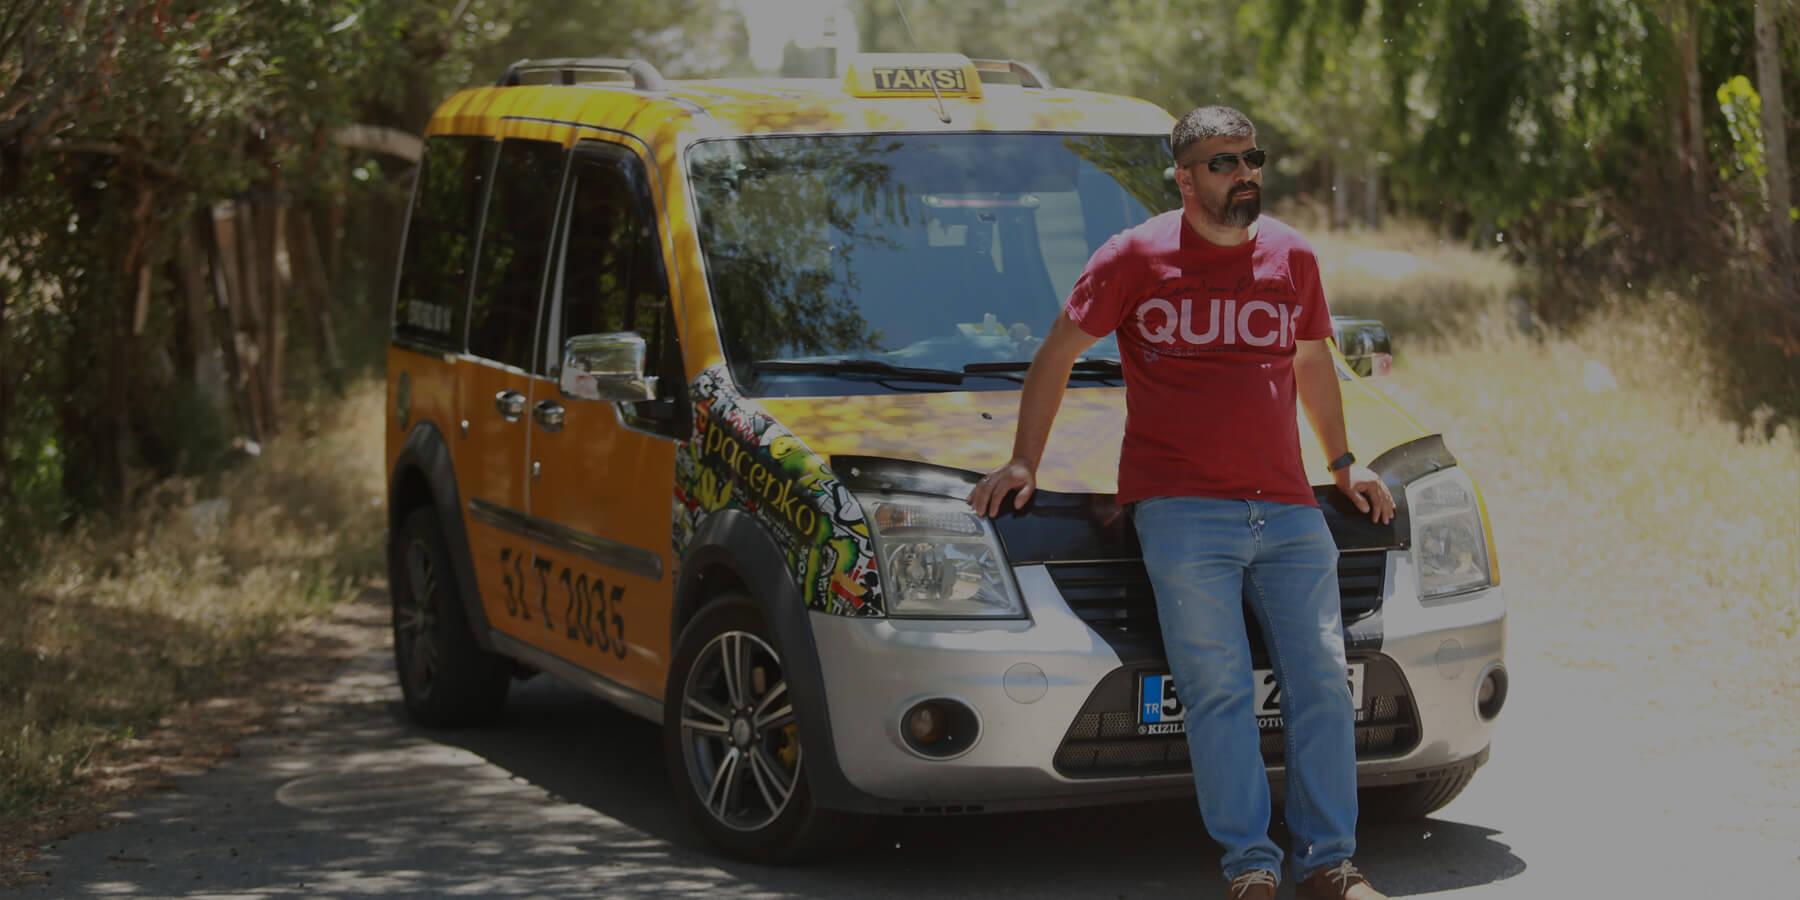 bor taksi